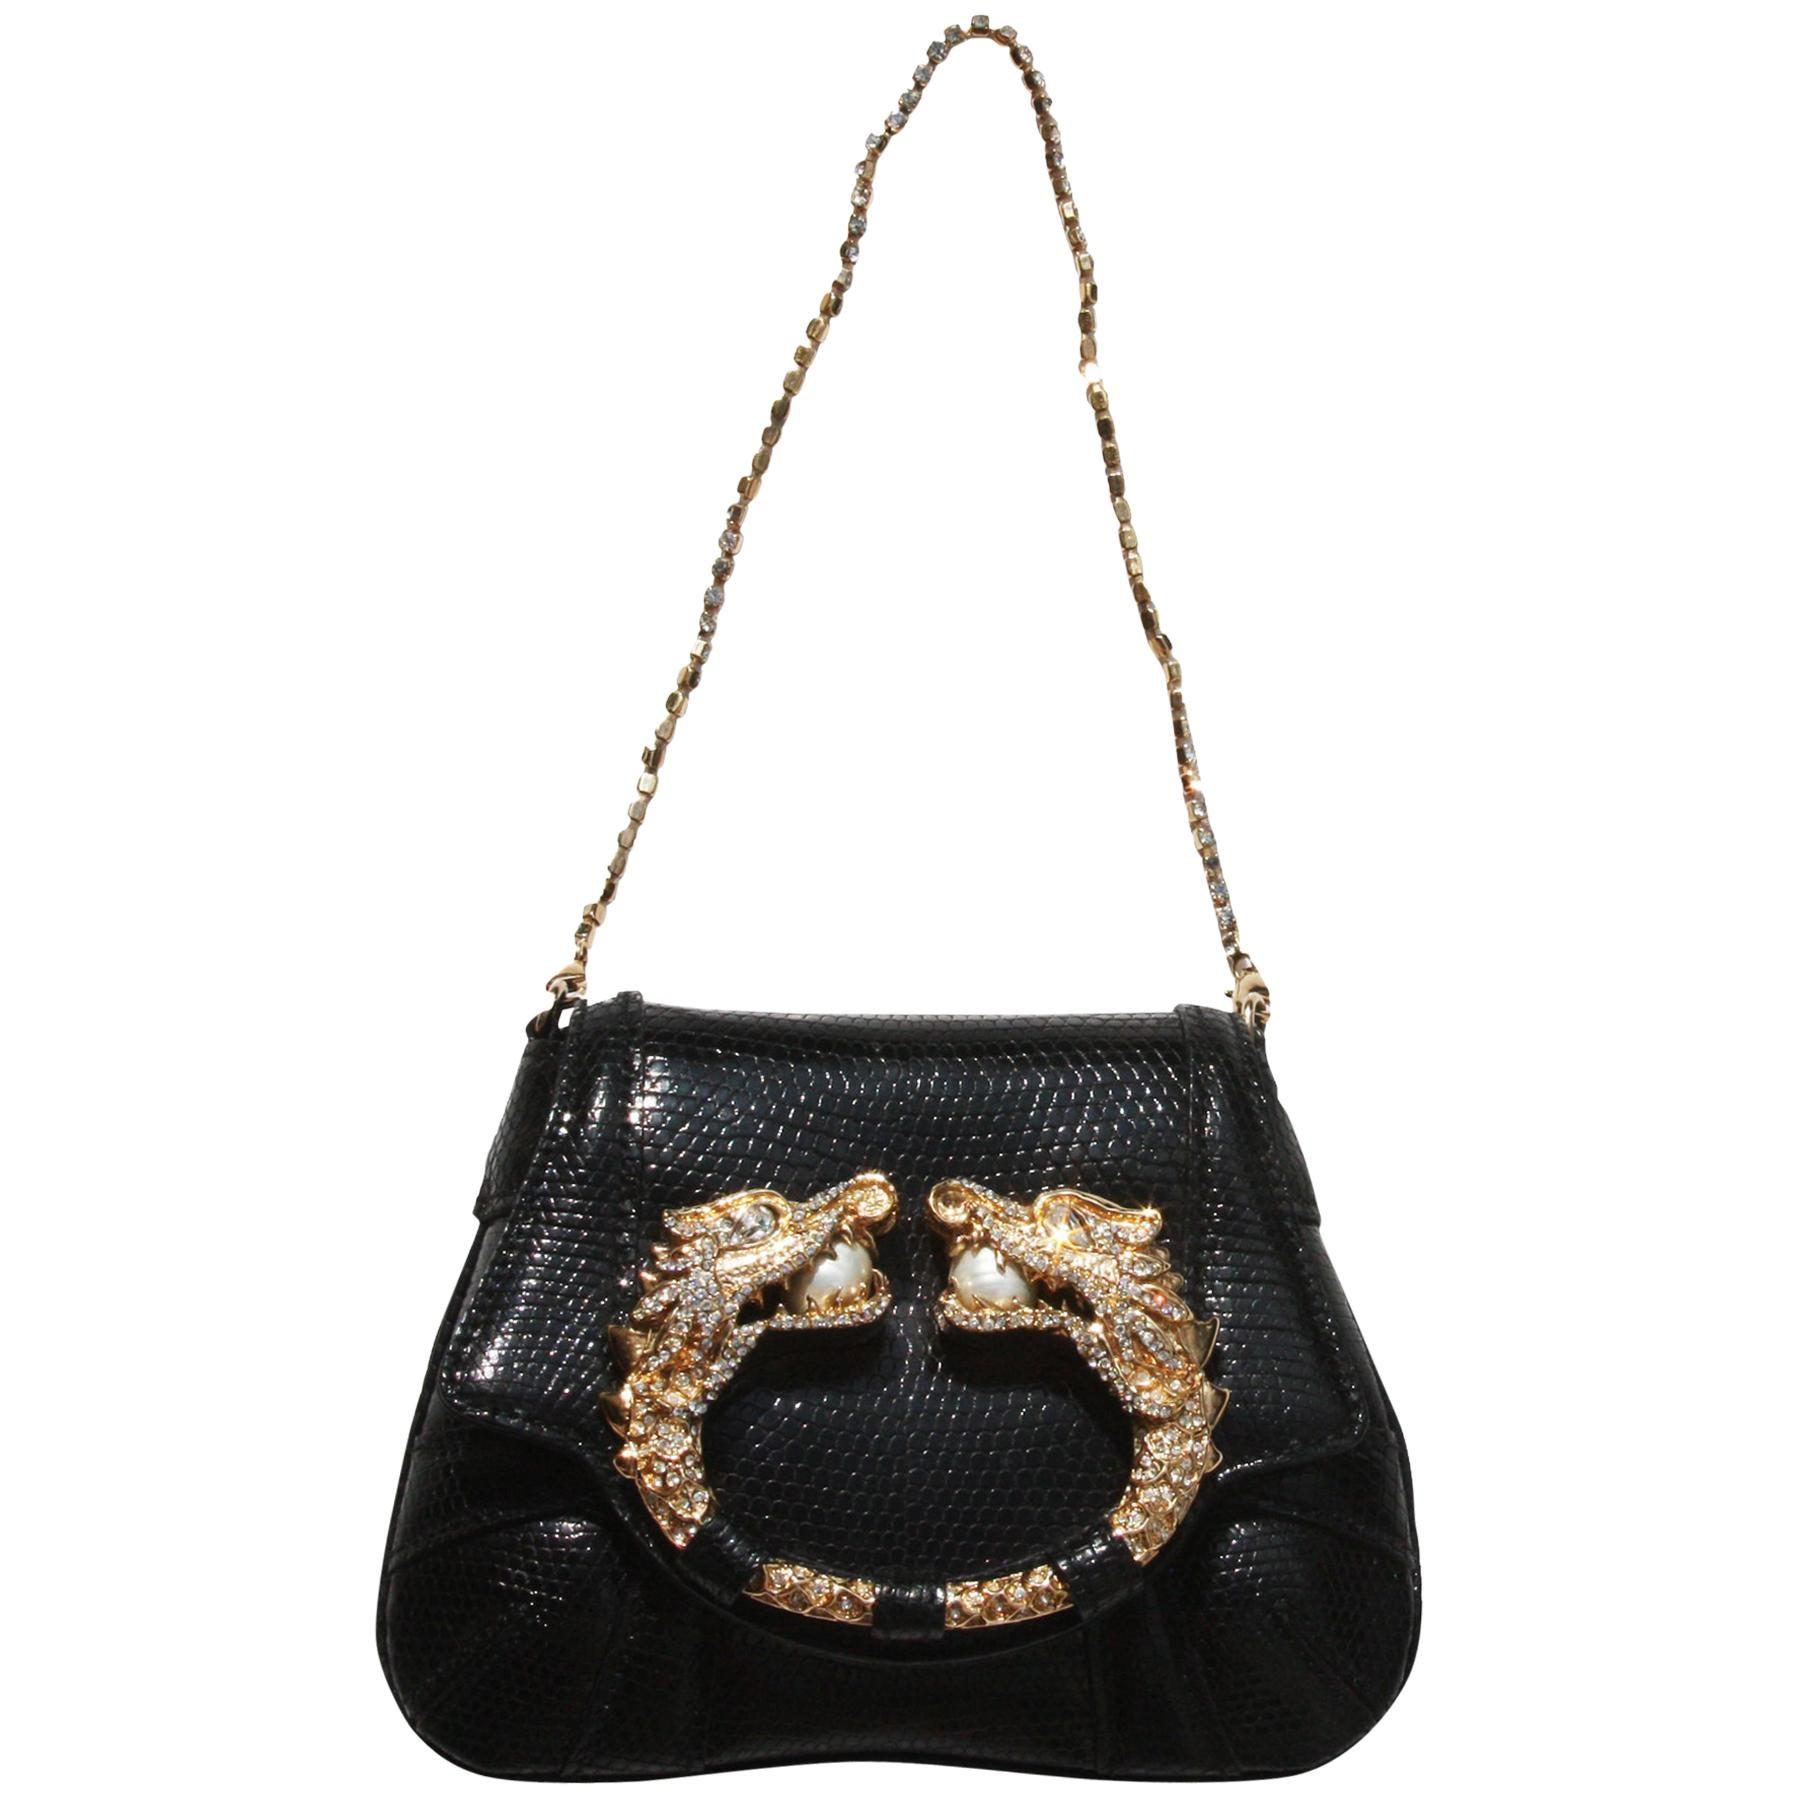 Tom Ford for Gucci F/W 2004 Lizard Evening Clutch Bag Jeweled Dragon